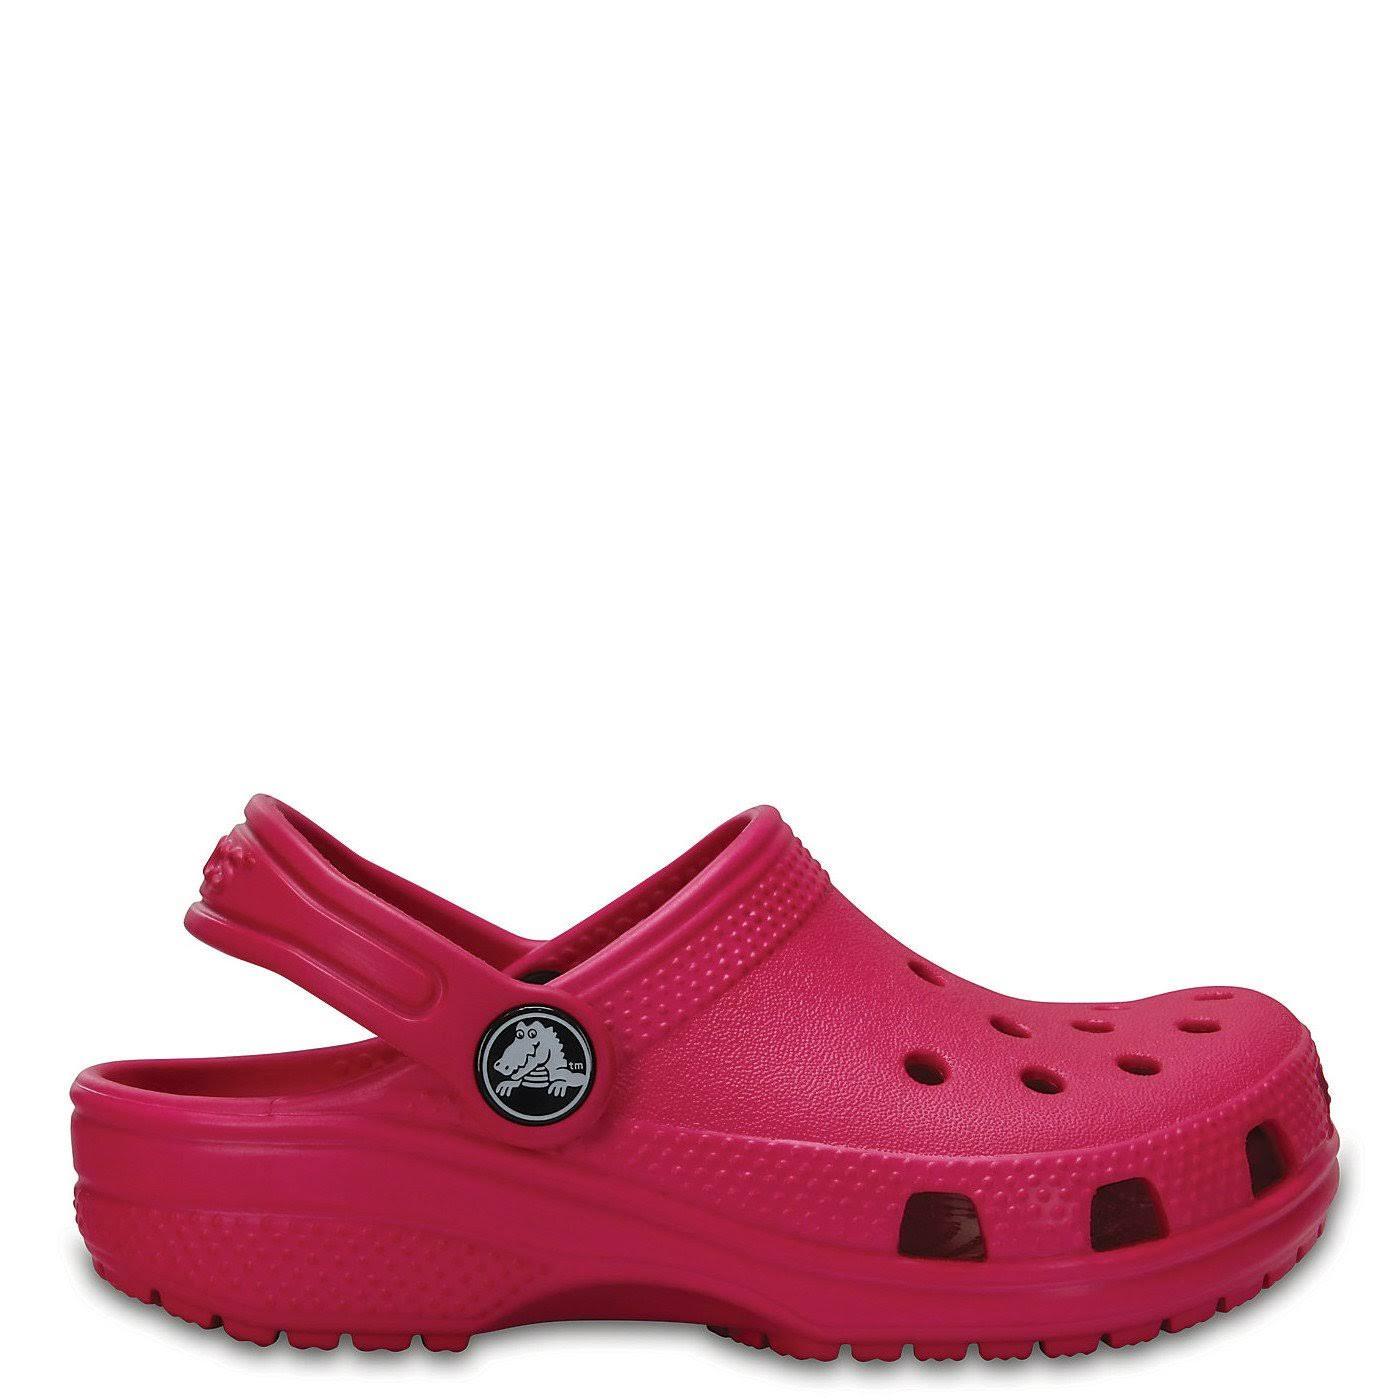 Pink Kids Clog Crocs Candy Classic 9IYEeWDH2